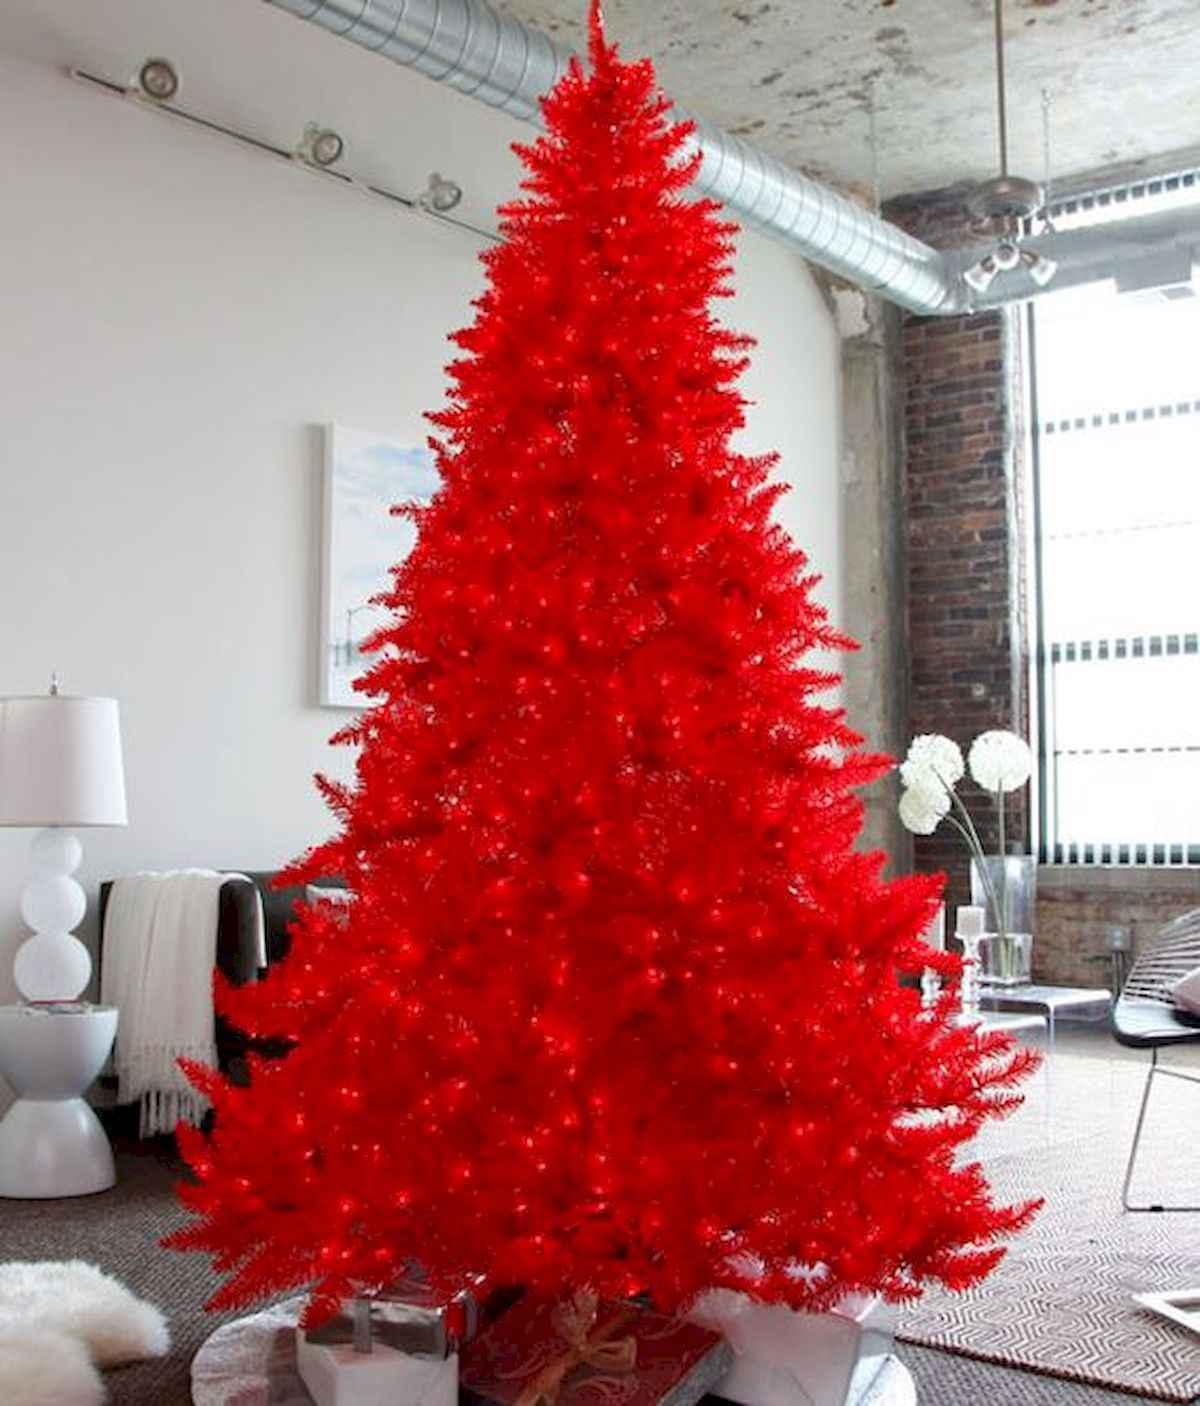 40 unique christmas tree ideas decorations (32)